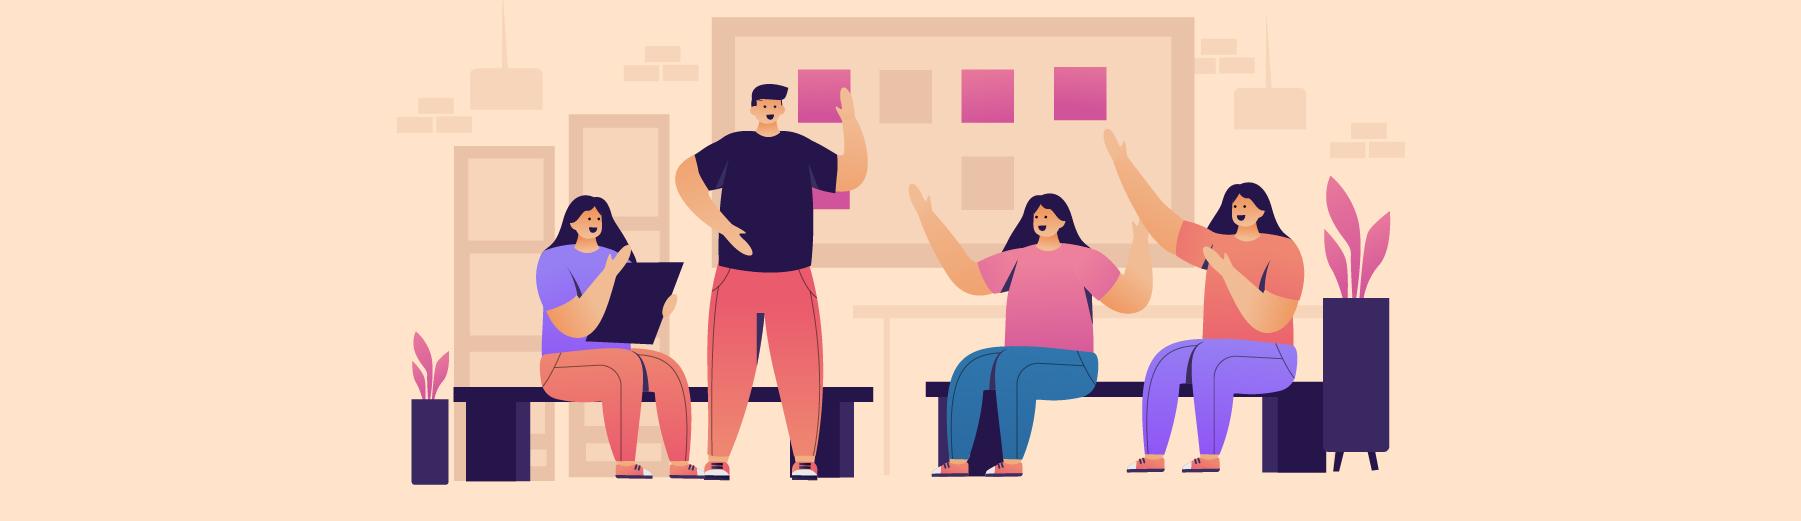 Internal Marketing: 5 Strategies That Work (Infographic)